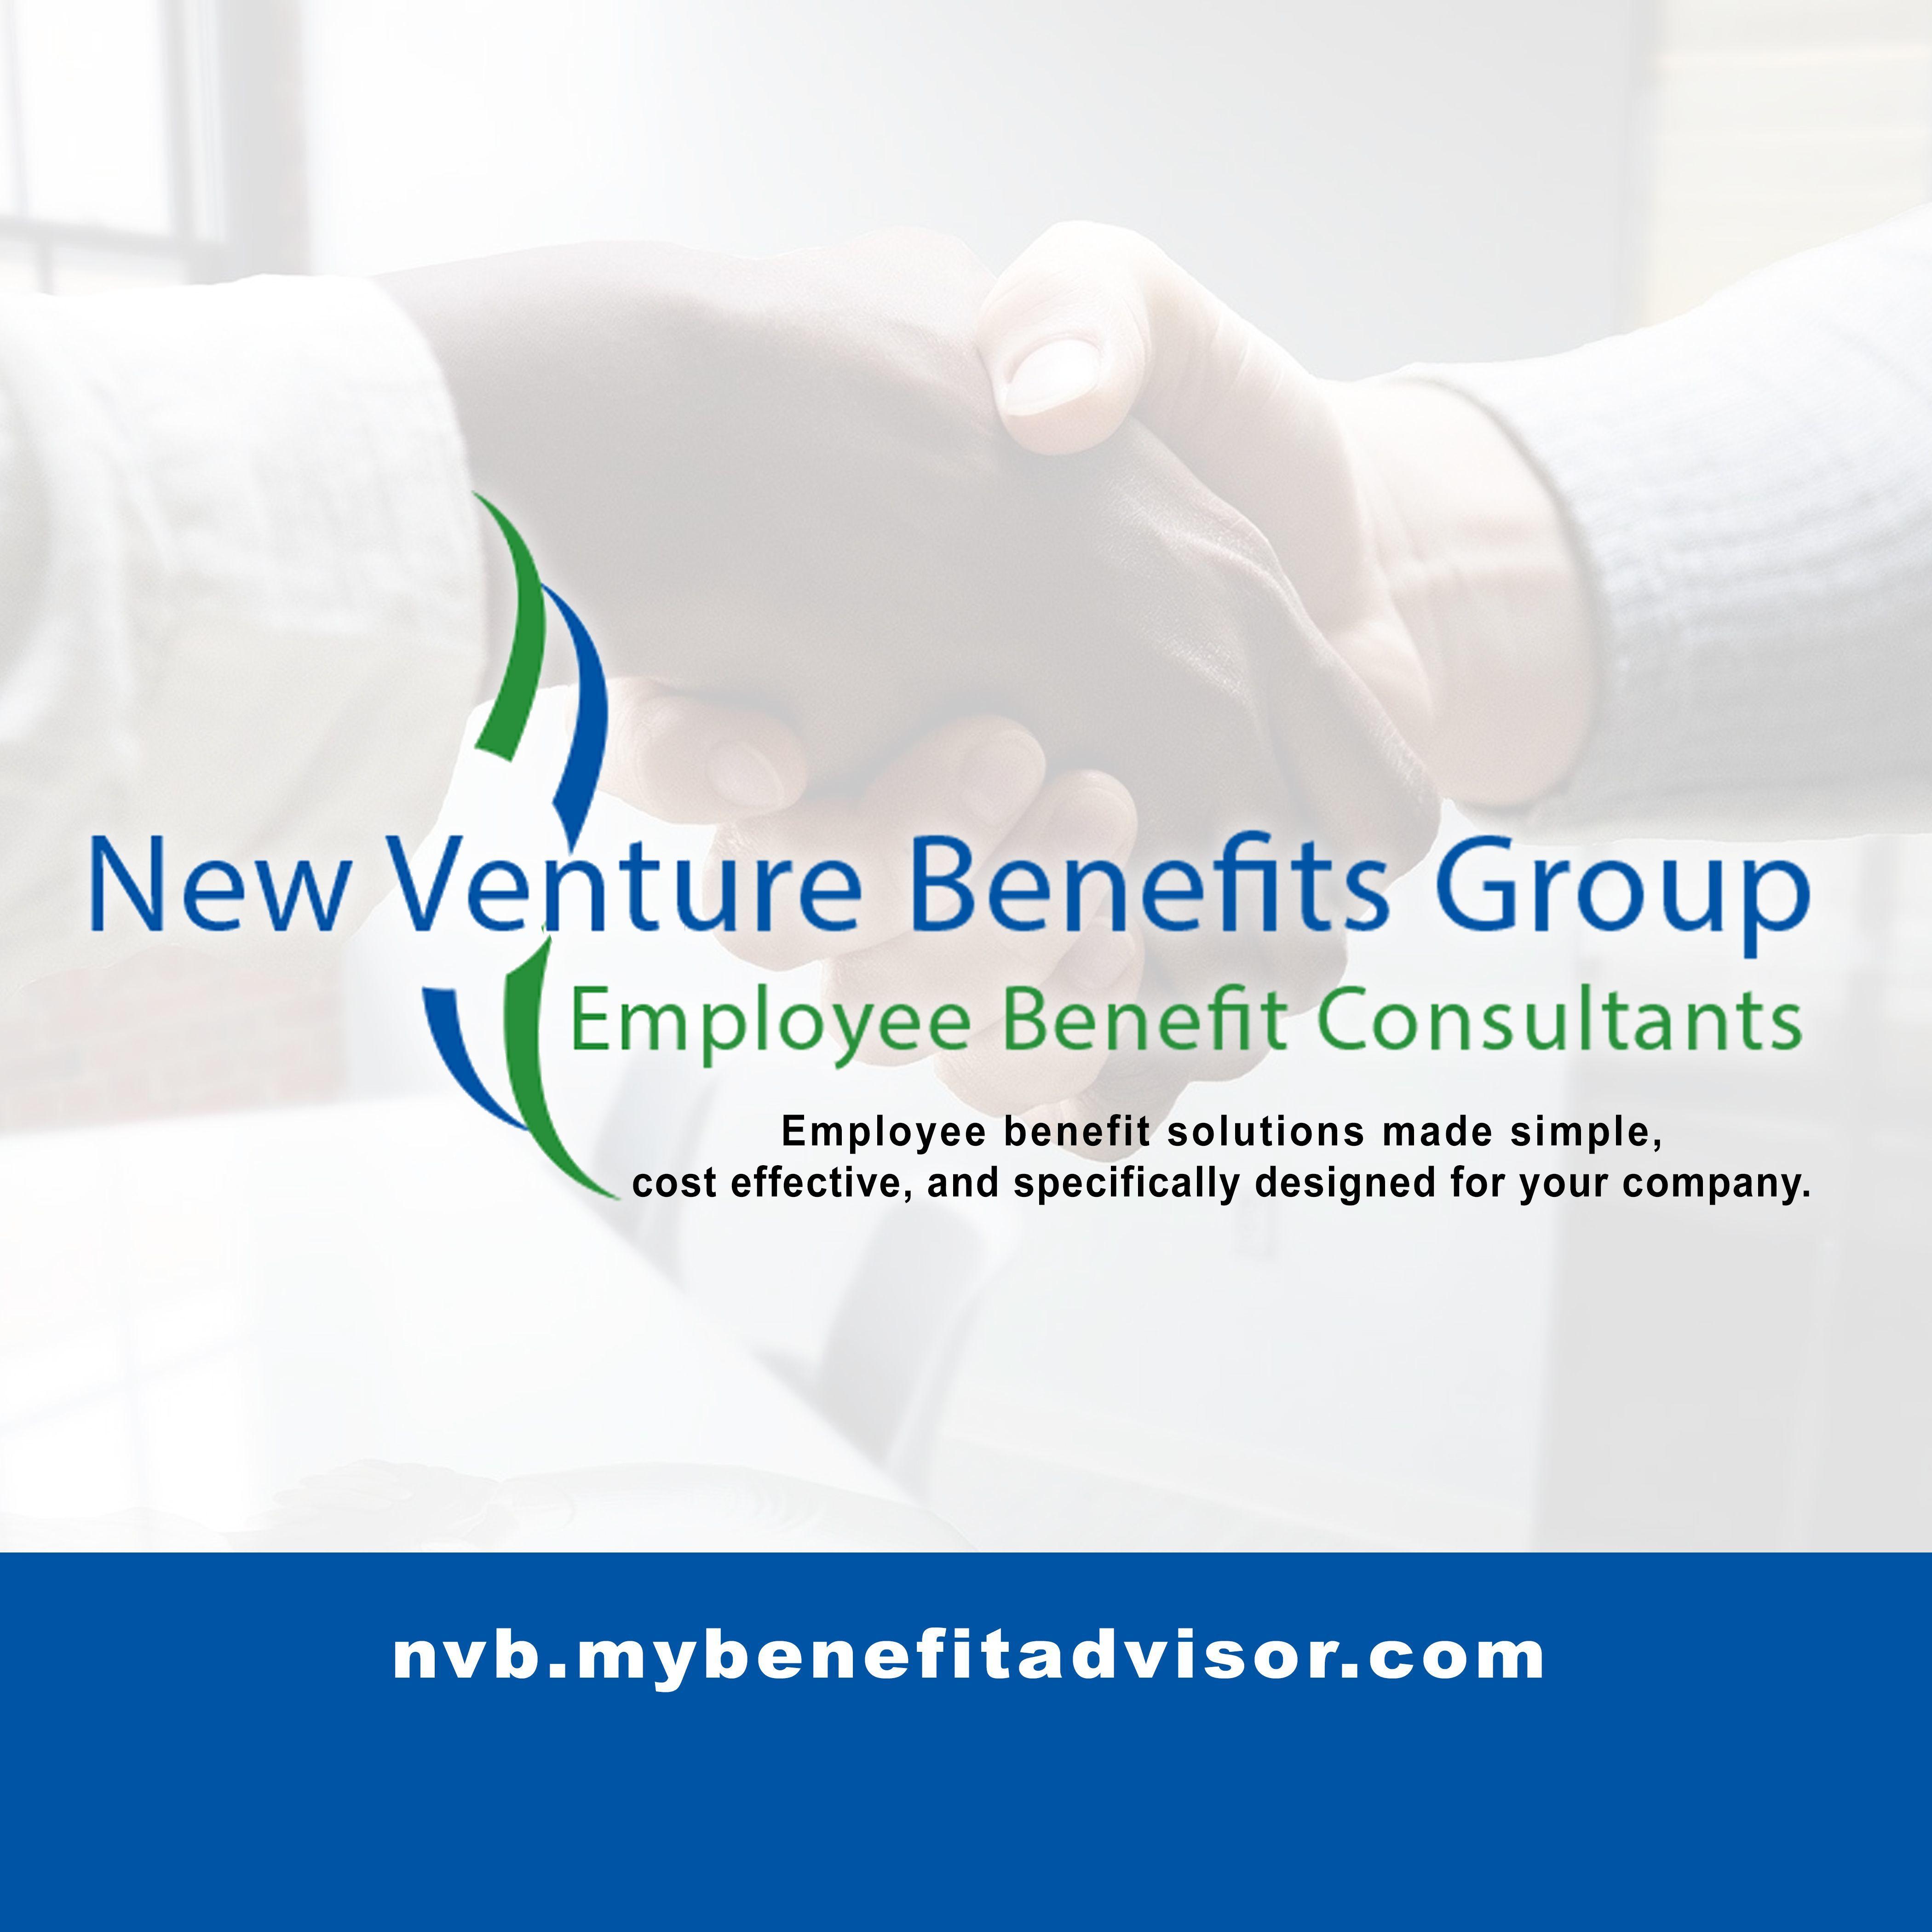 New Venture Benefits Group